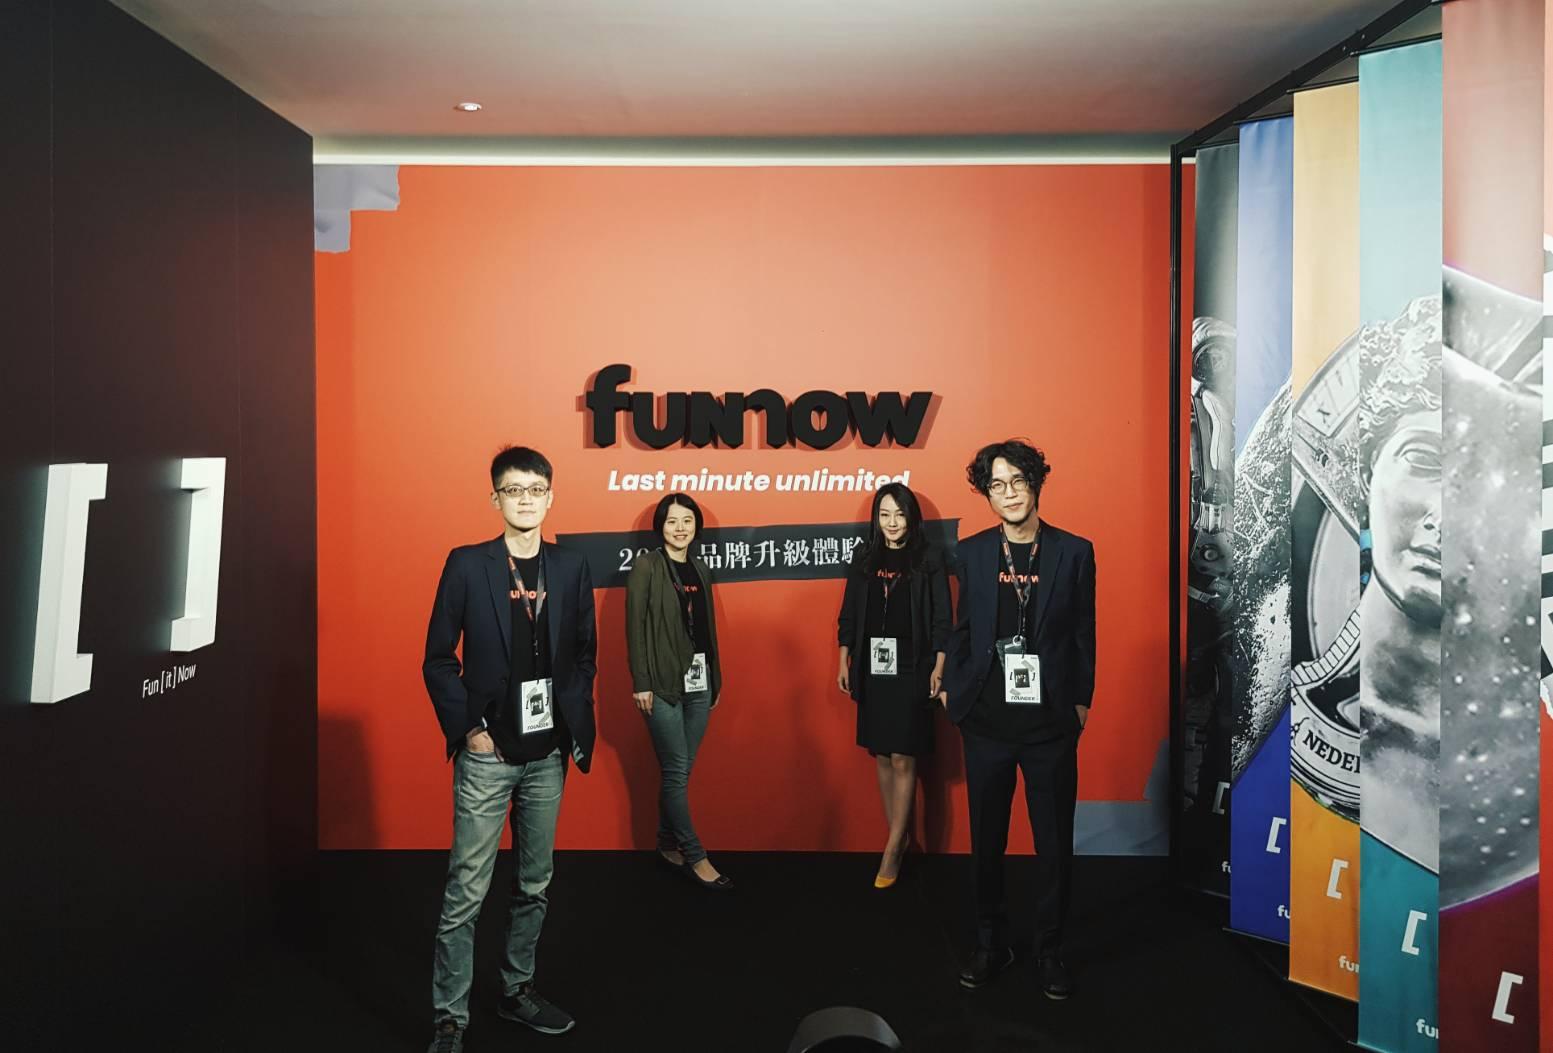 FunNow - Business Development Manager